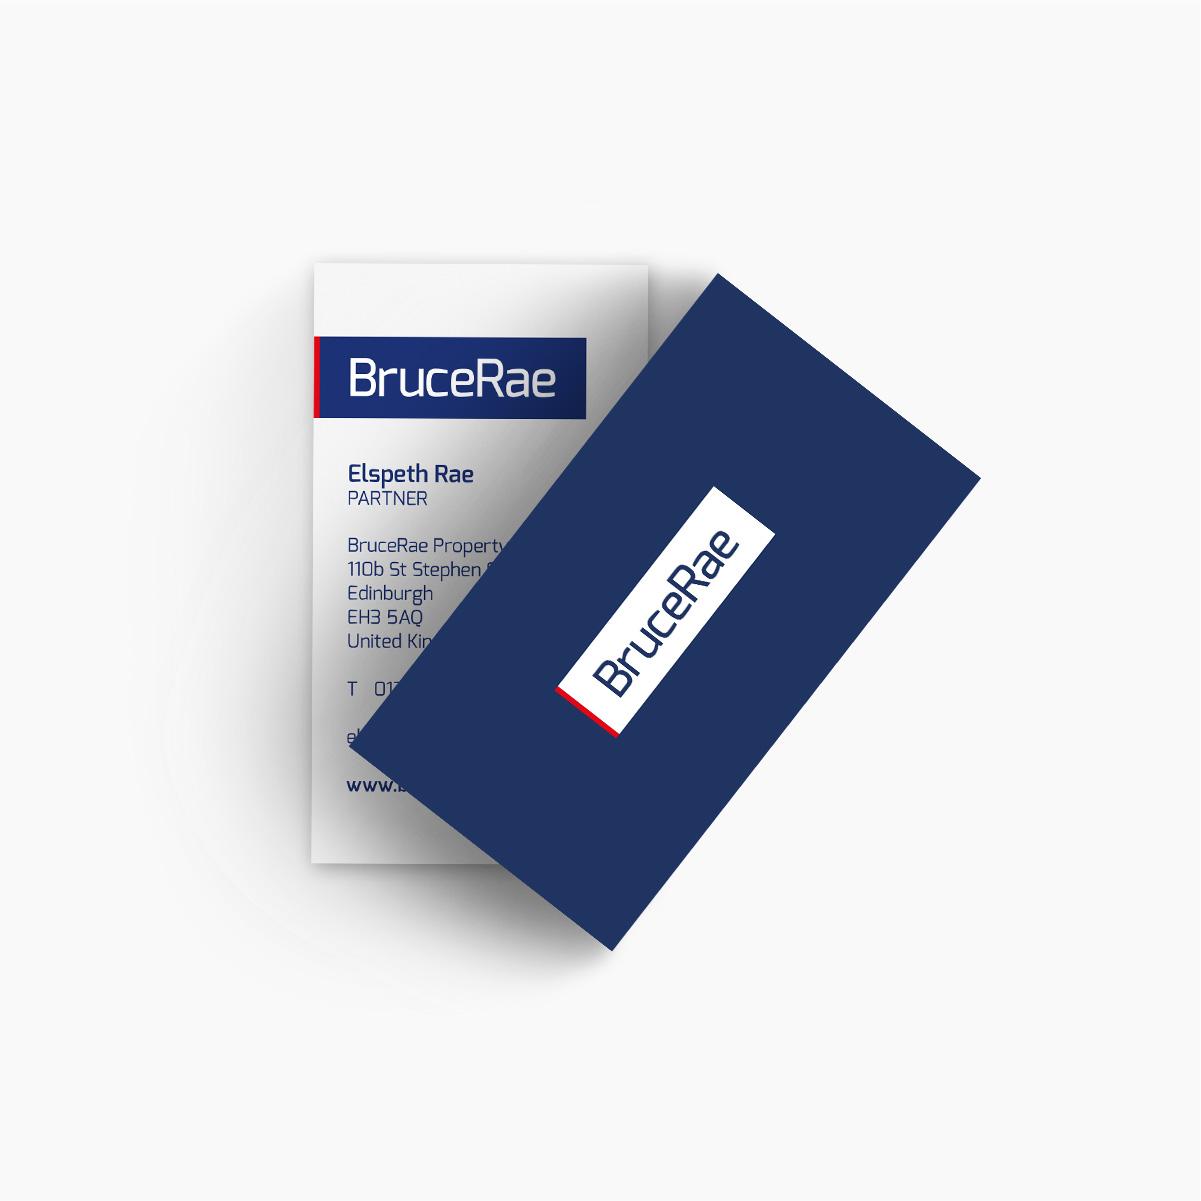 Bruce Rae Business Card Thumbnail